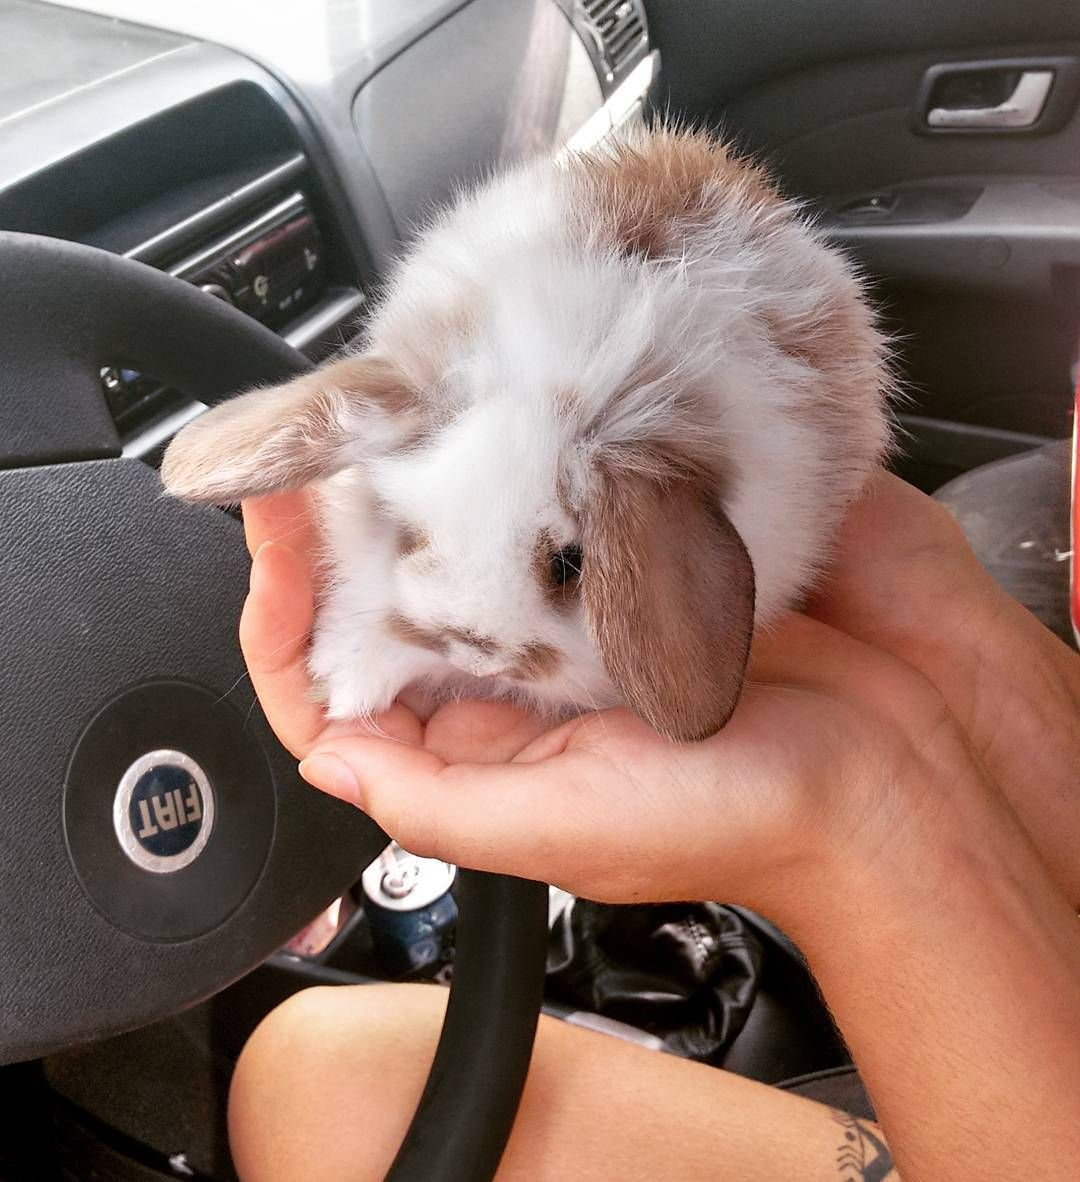 aqui levamos os feriados mto a sério.. kkk Feliz Páscoa a todos  #easter #rabbit by jacobmusicofficial